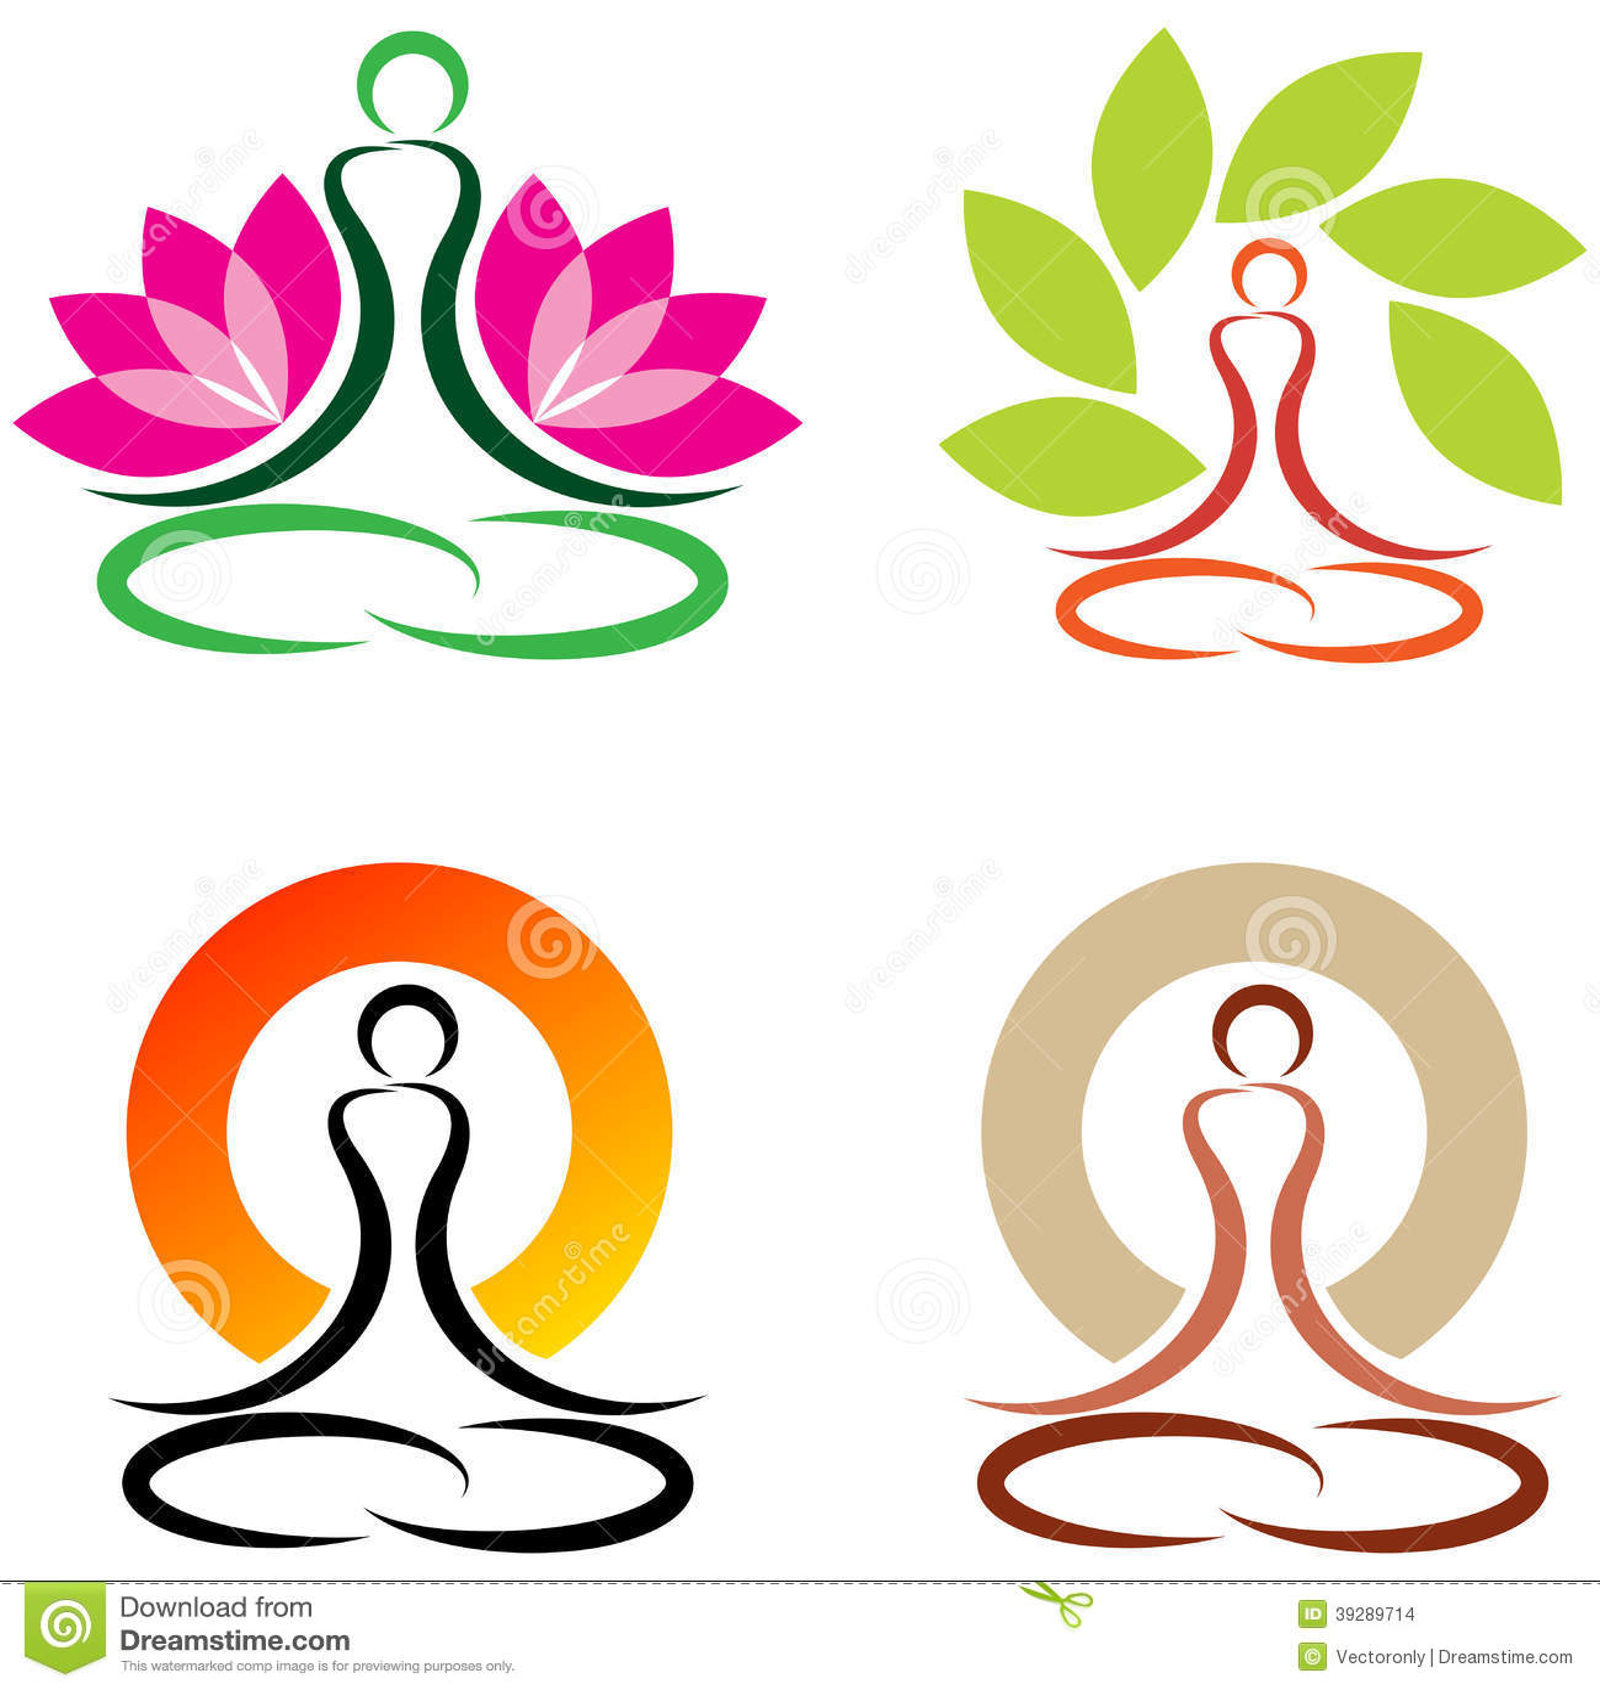 Yoga stock vector. Image of logo, buddhism, lotus, idea ...